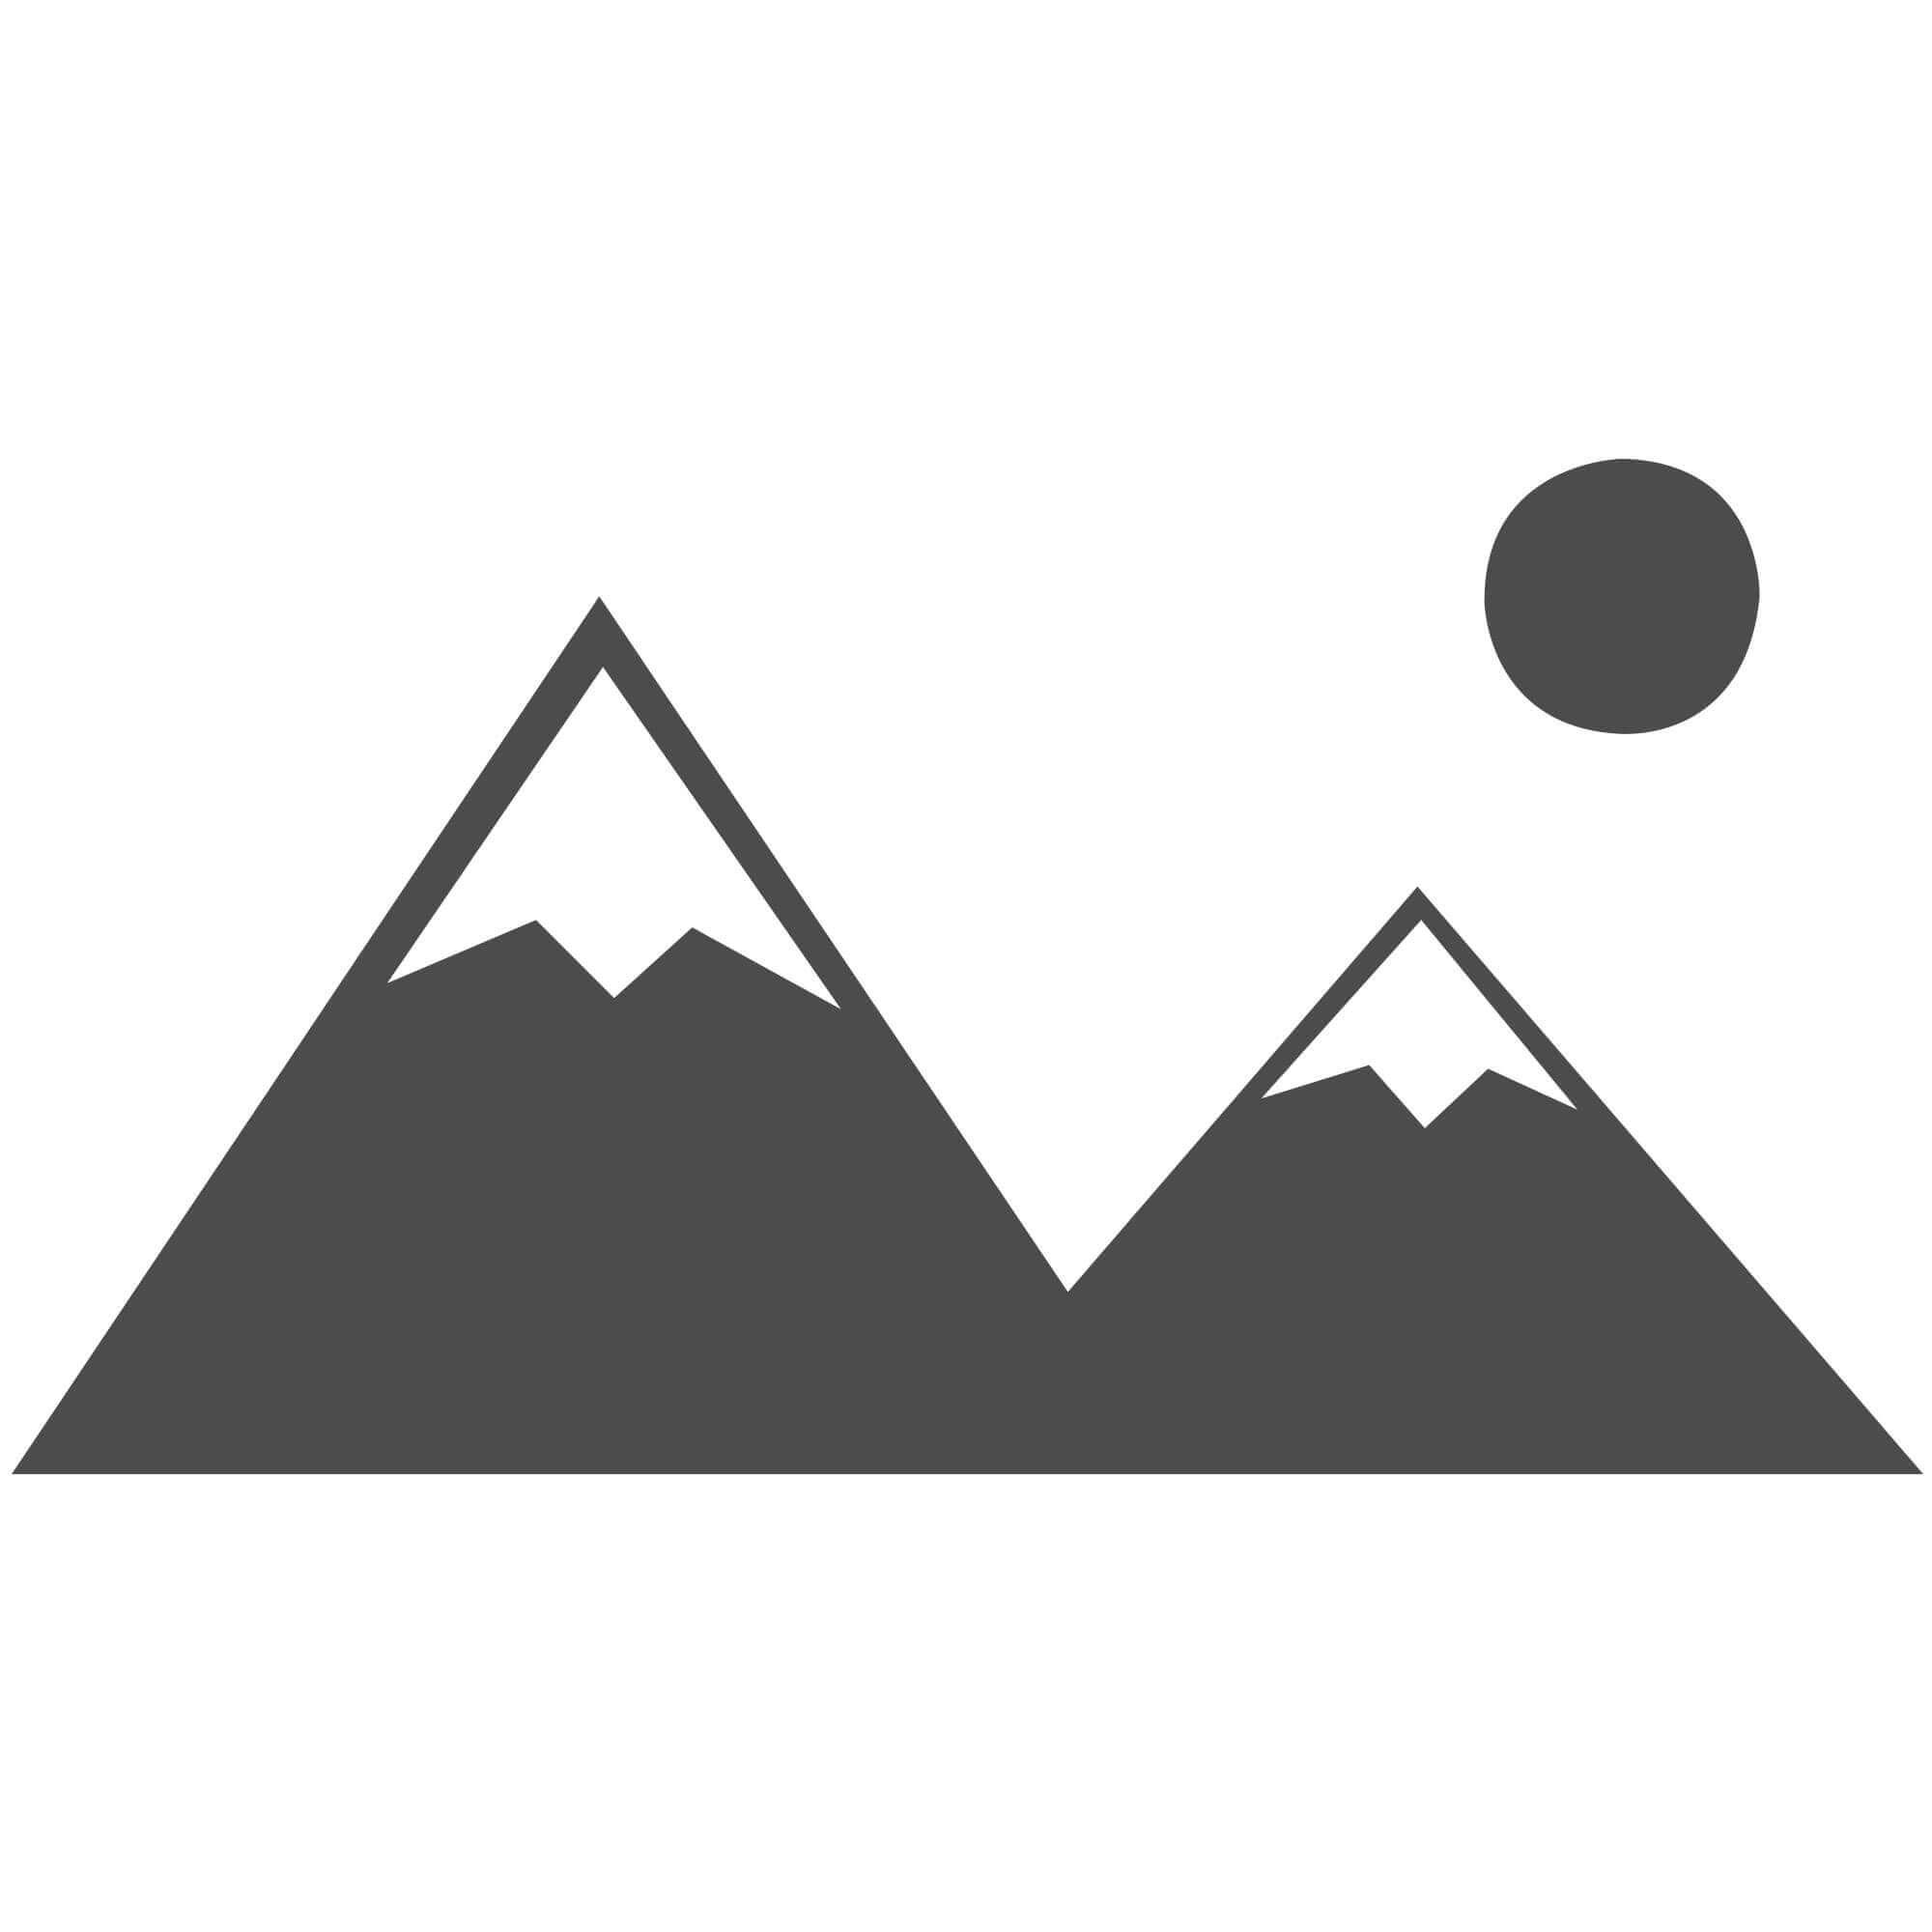 Alhambra Traditional Rug - 6345c ivory/beige